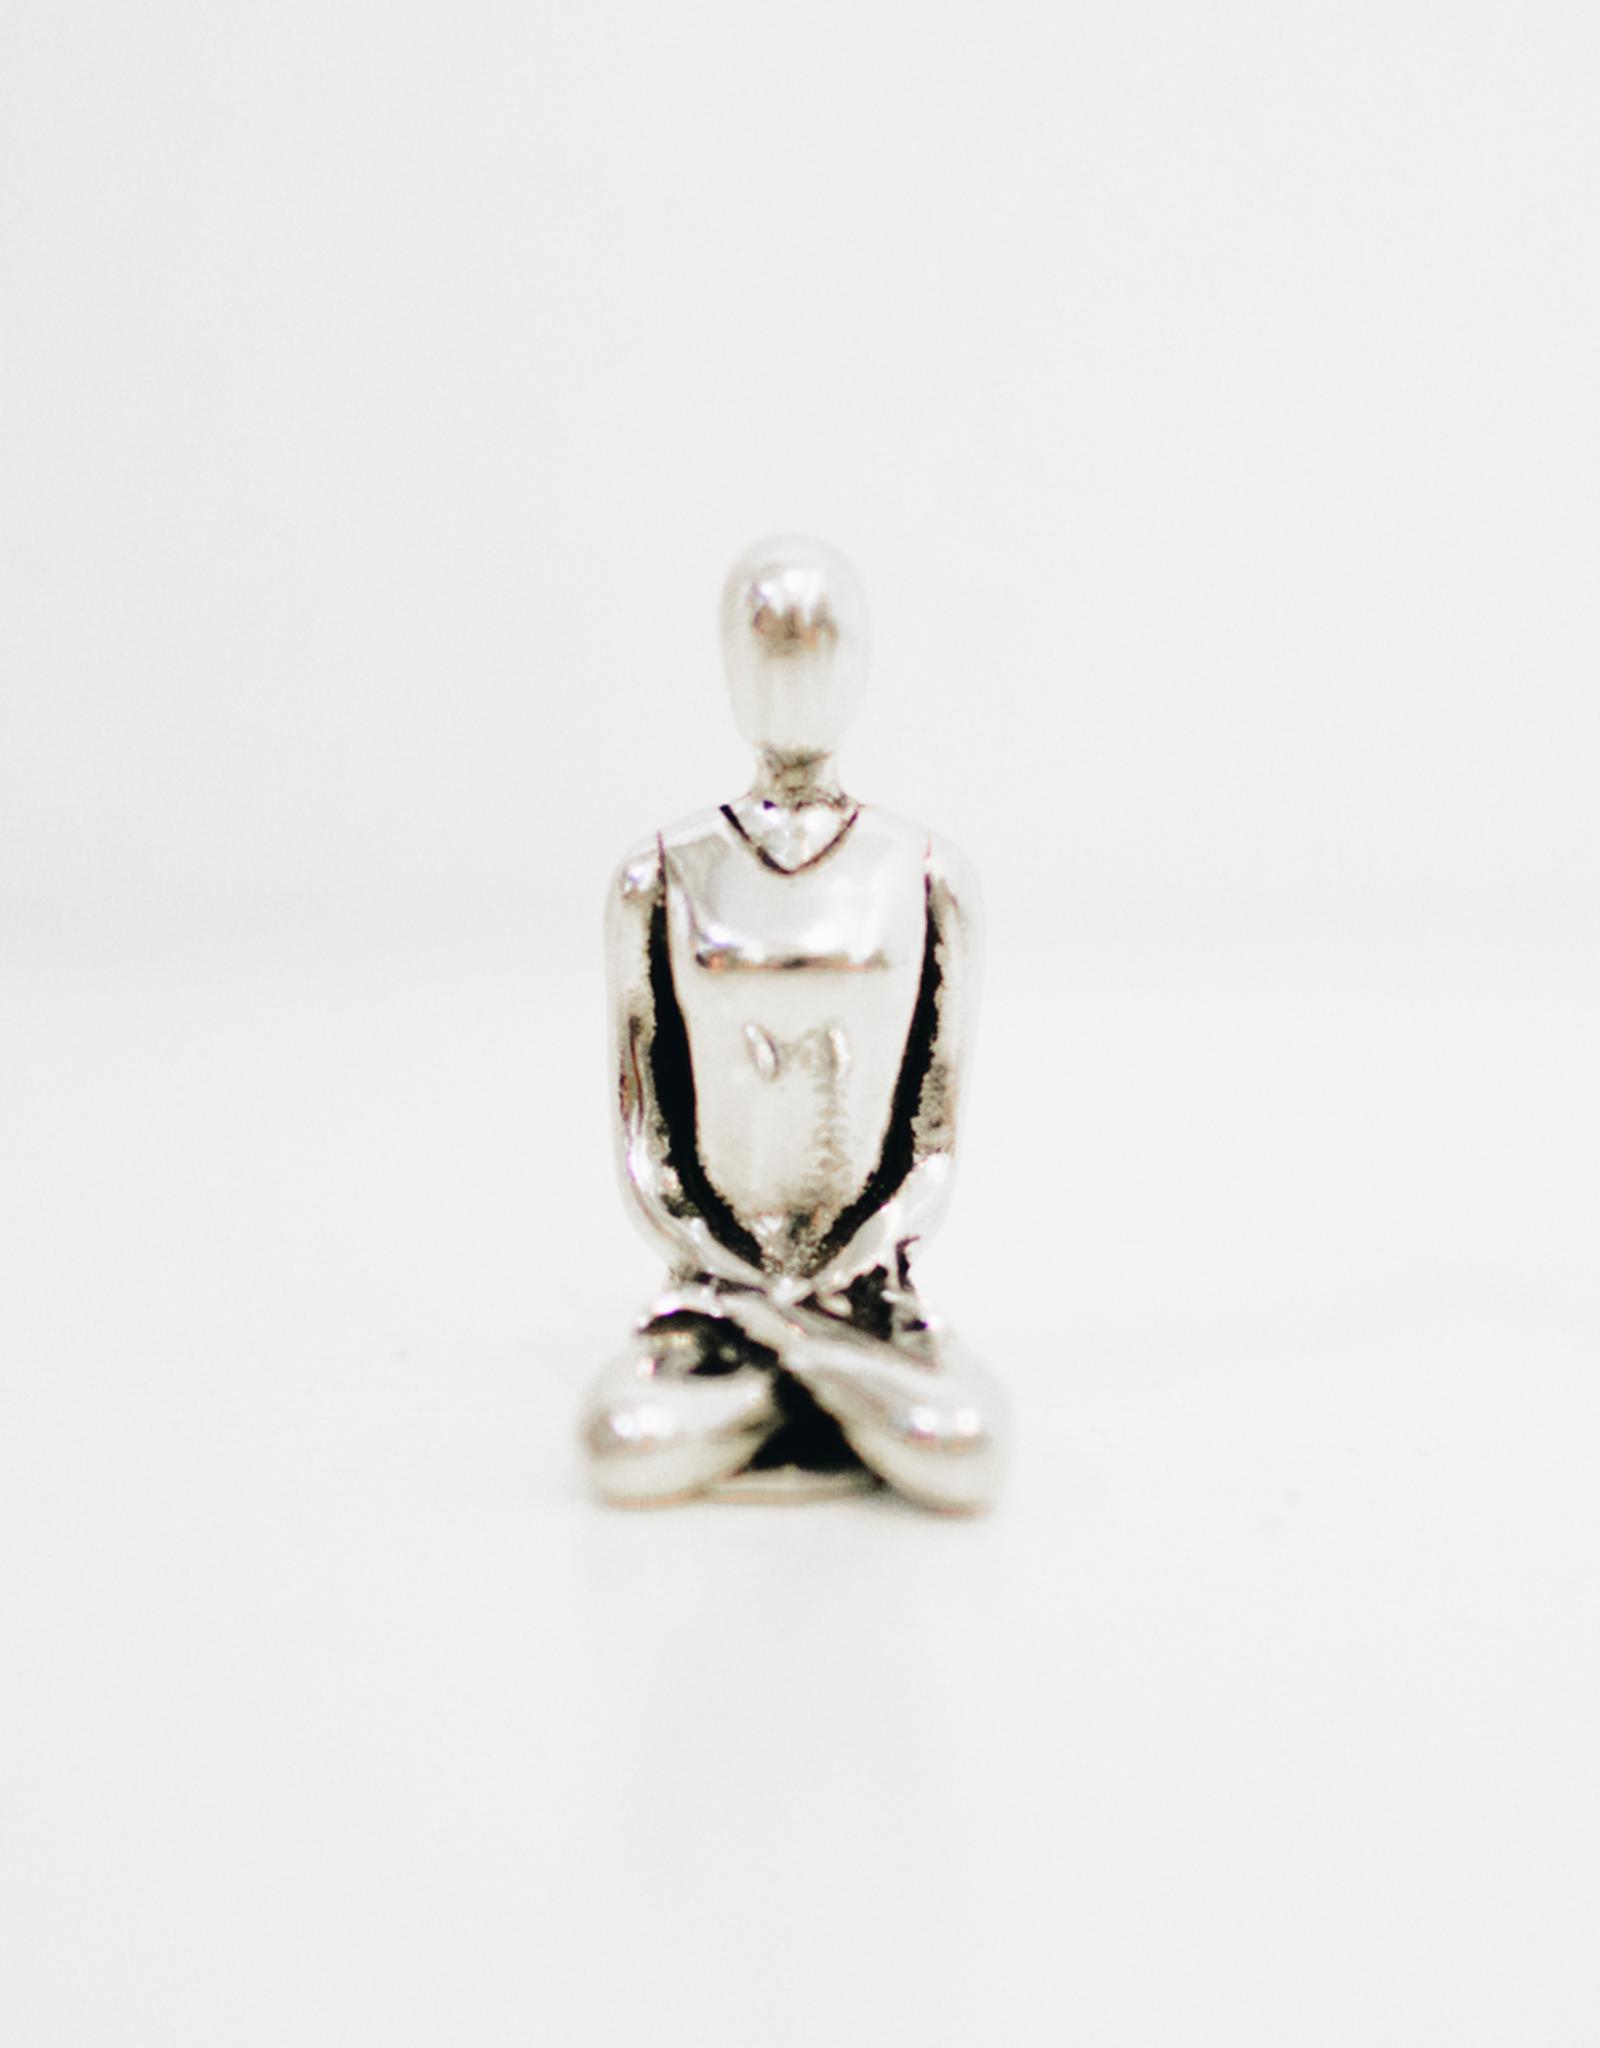 Lotus Yoga Sculpture